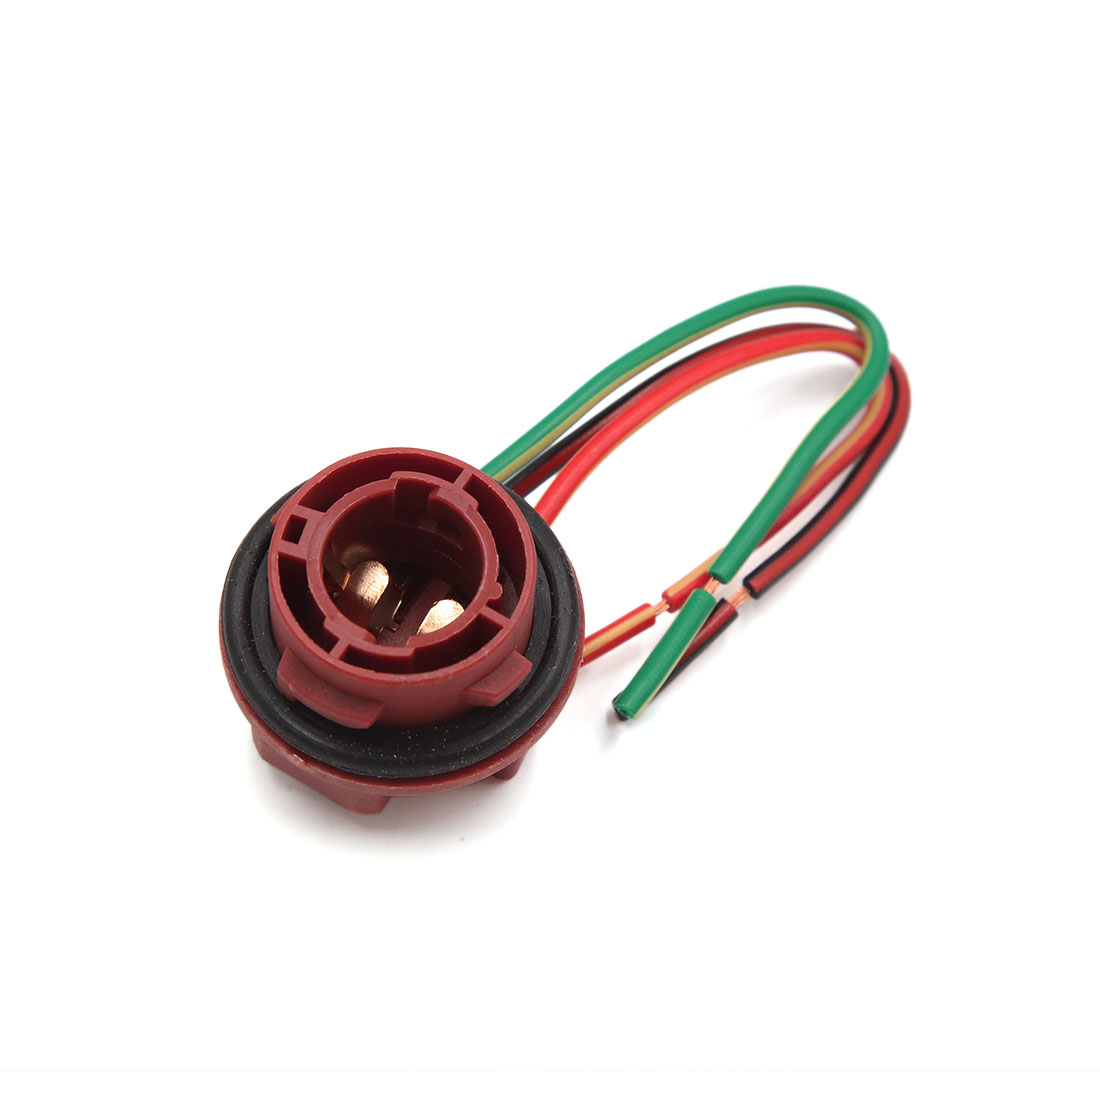 2pcs 1016 3-Wires Brake Signal Light Bulb Extension Harness Socket Connector - image 1 de 2